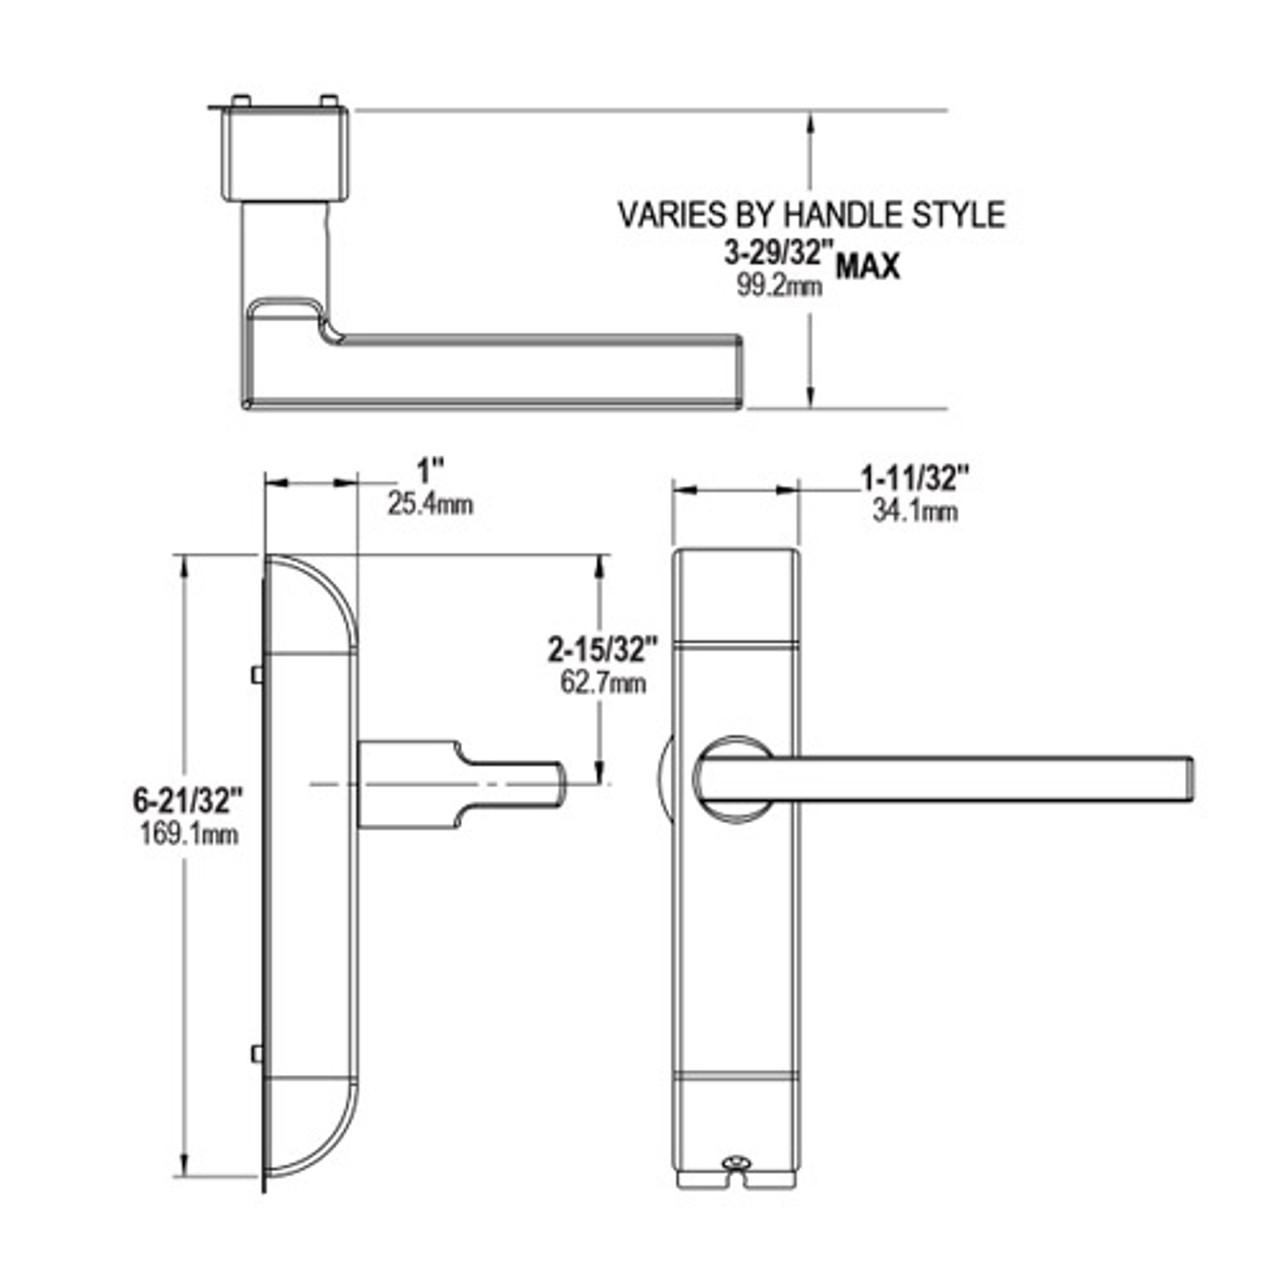 4600M-MI-642-US10B Adams Rite MI Designer handle Dimensional View